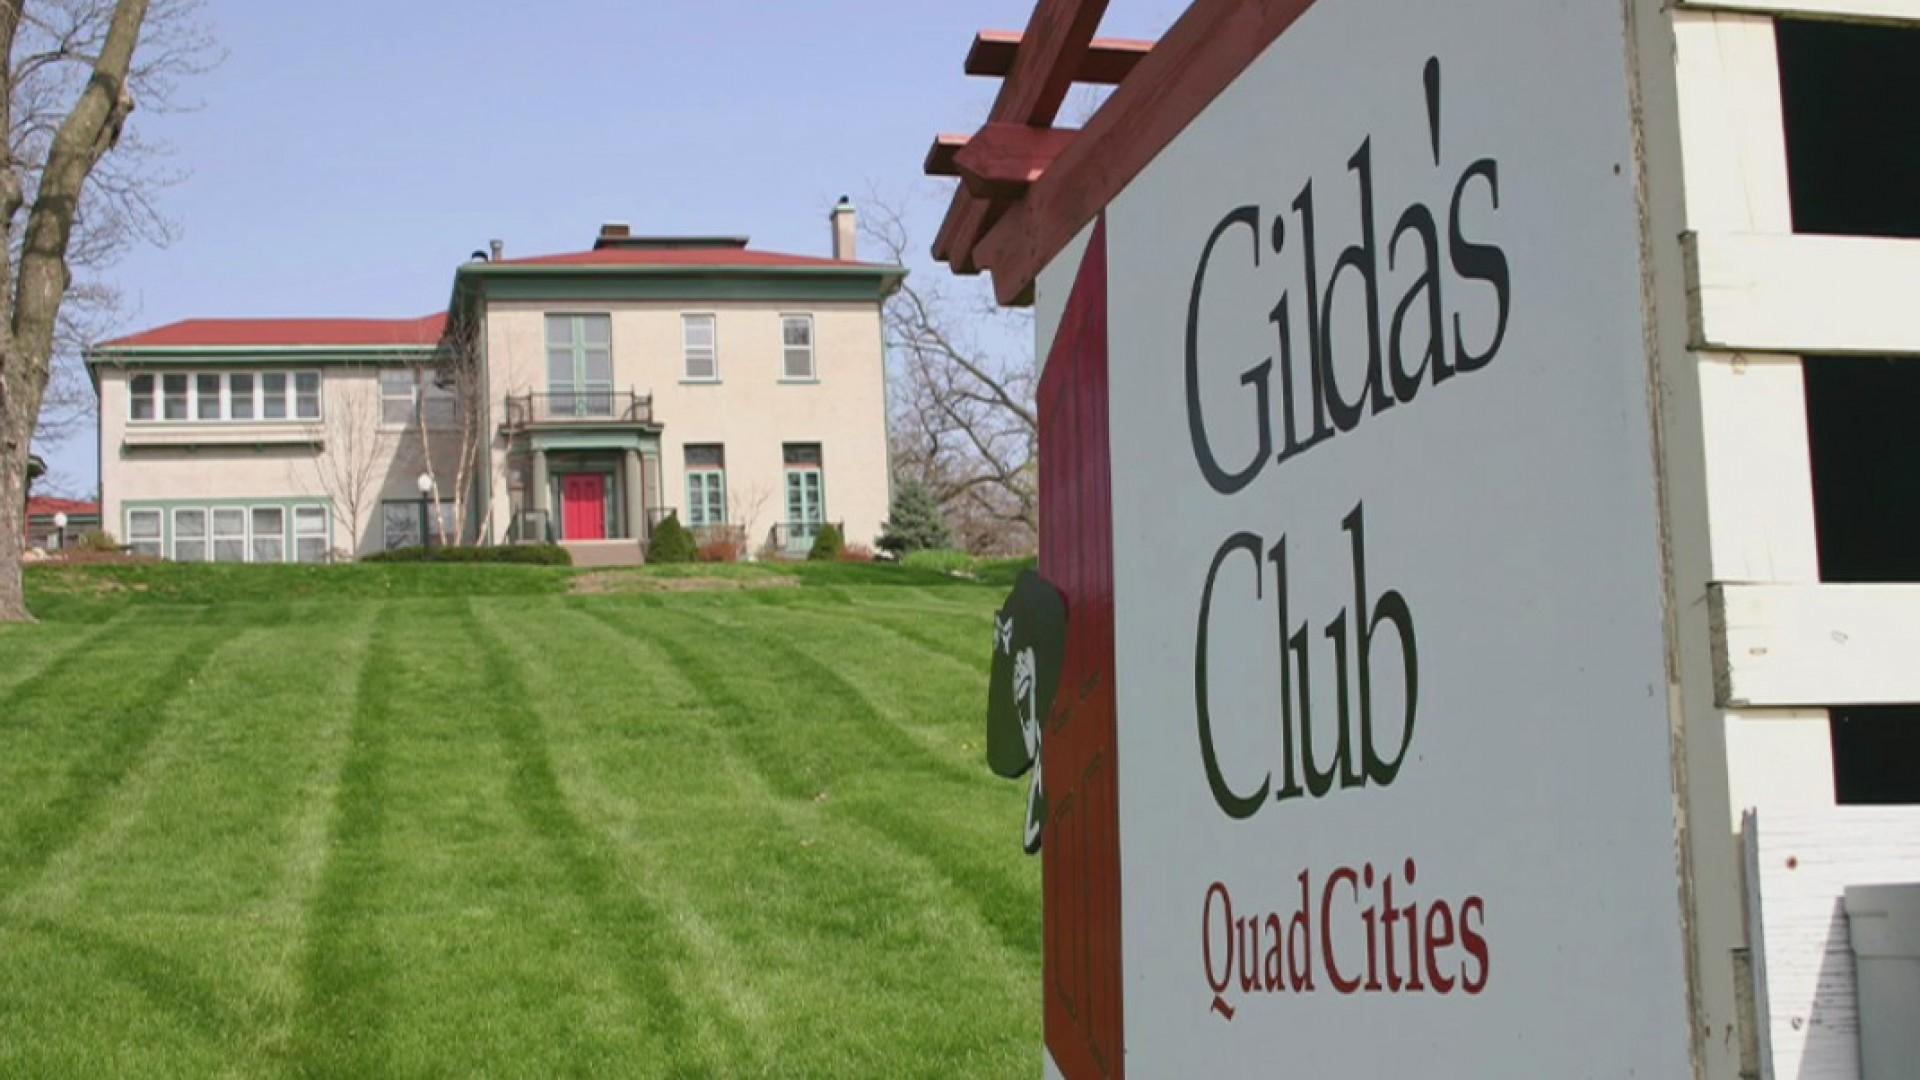 Gilda's Club Quad Cities | Biomarkers 101